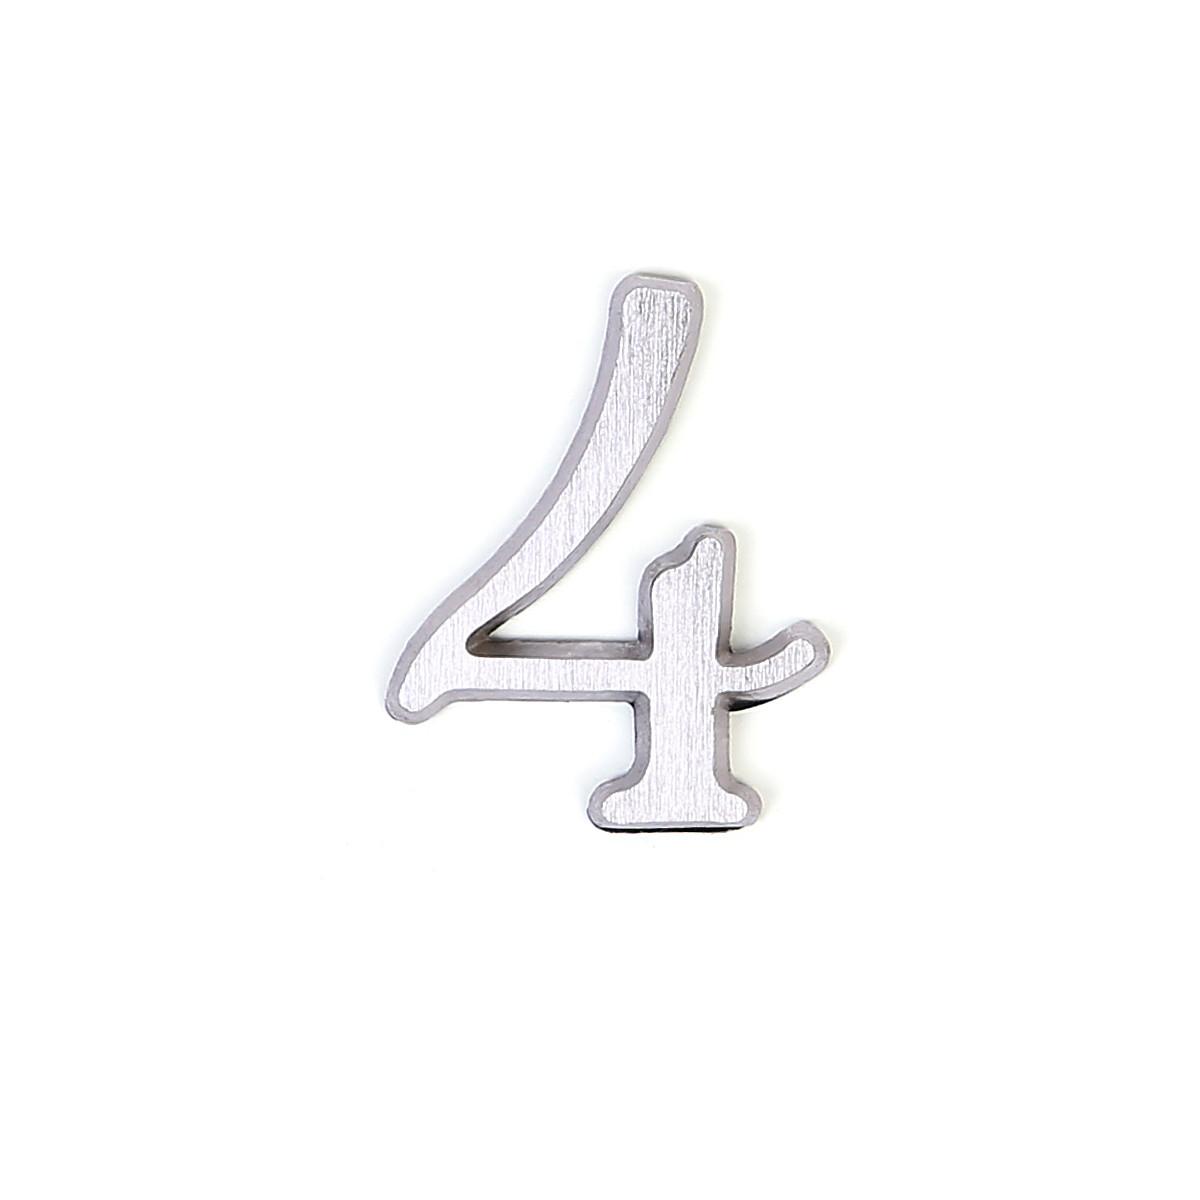 Номер из латуни на дверь Larvij цифра 4 никель (LNB5 BLN#4)